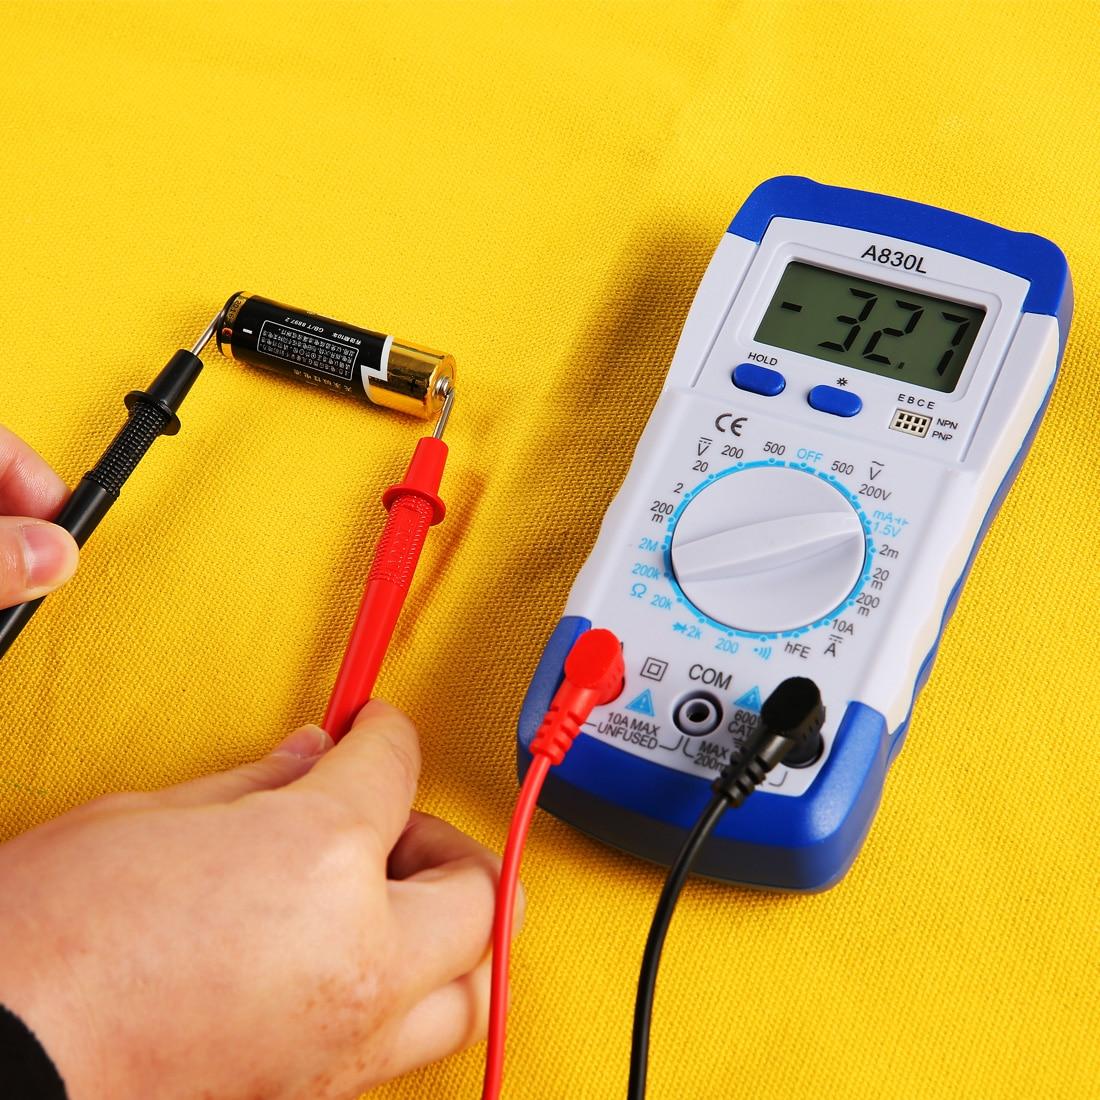 Multímetro de prueba de voltios multímetro de corriente eléctrica LCD AC DC voltímetro ohmmetro prueba accesorios prácticos multímetro Digital